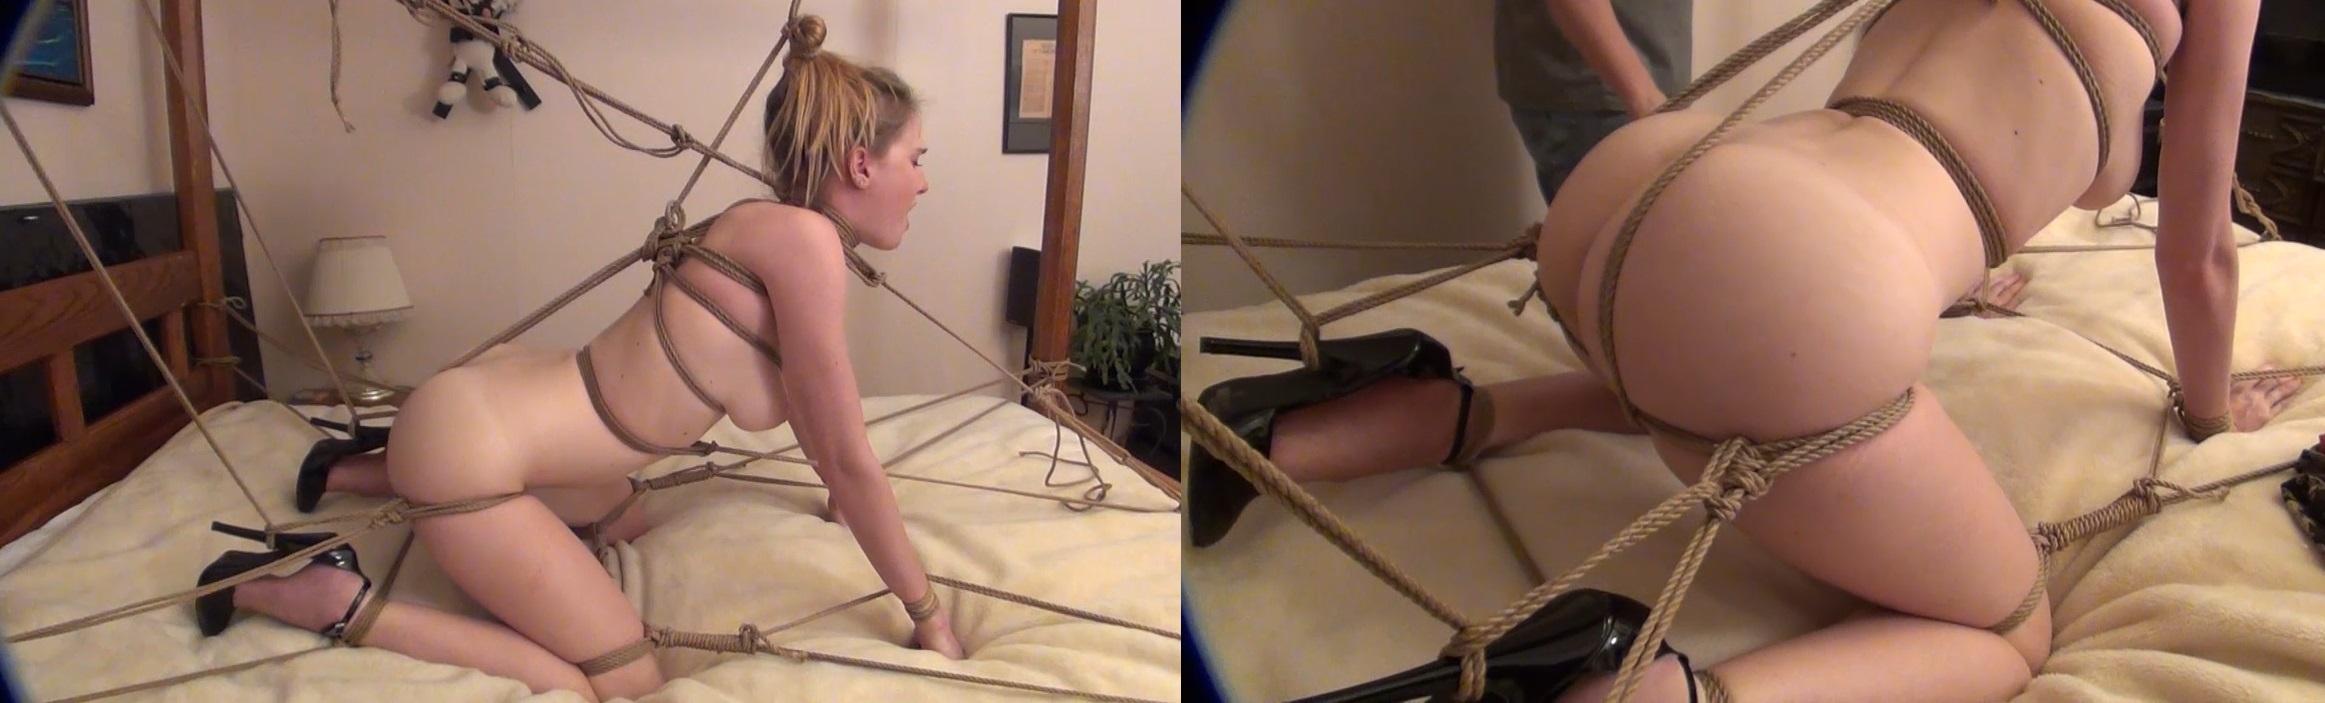 Bondage Tied Up Tight In Ropes